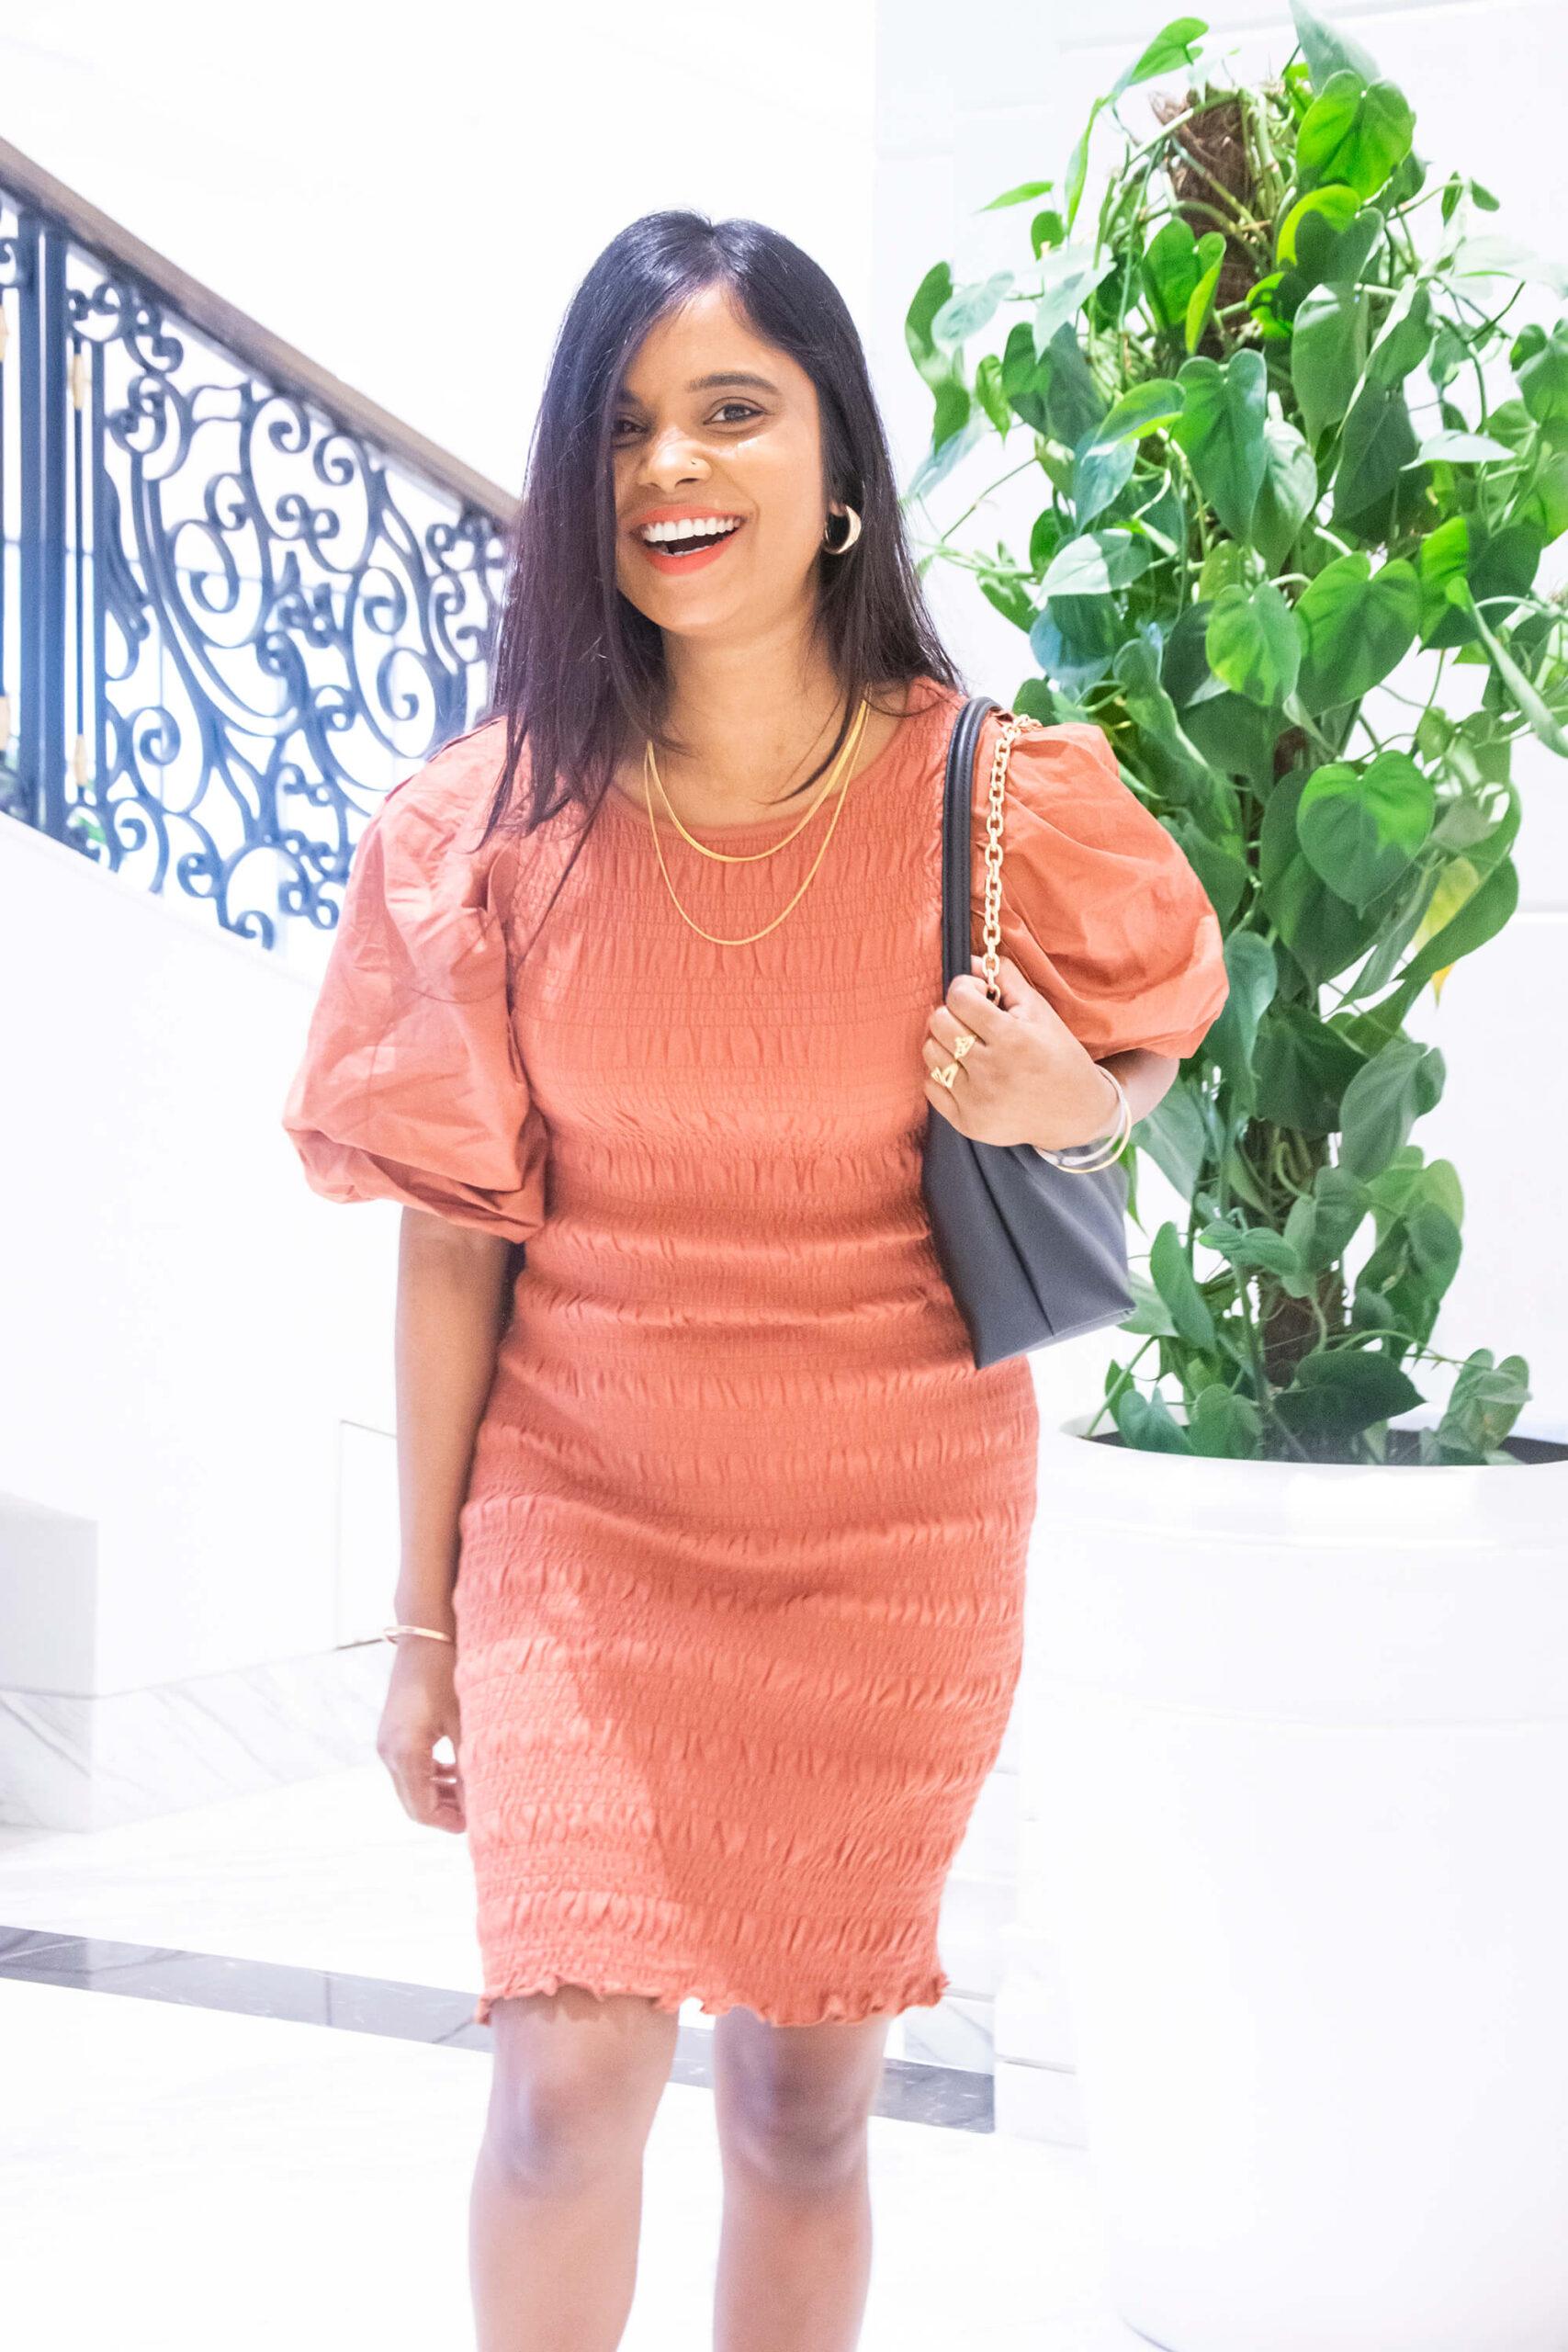 h&m rust orange dress